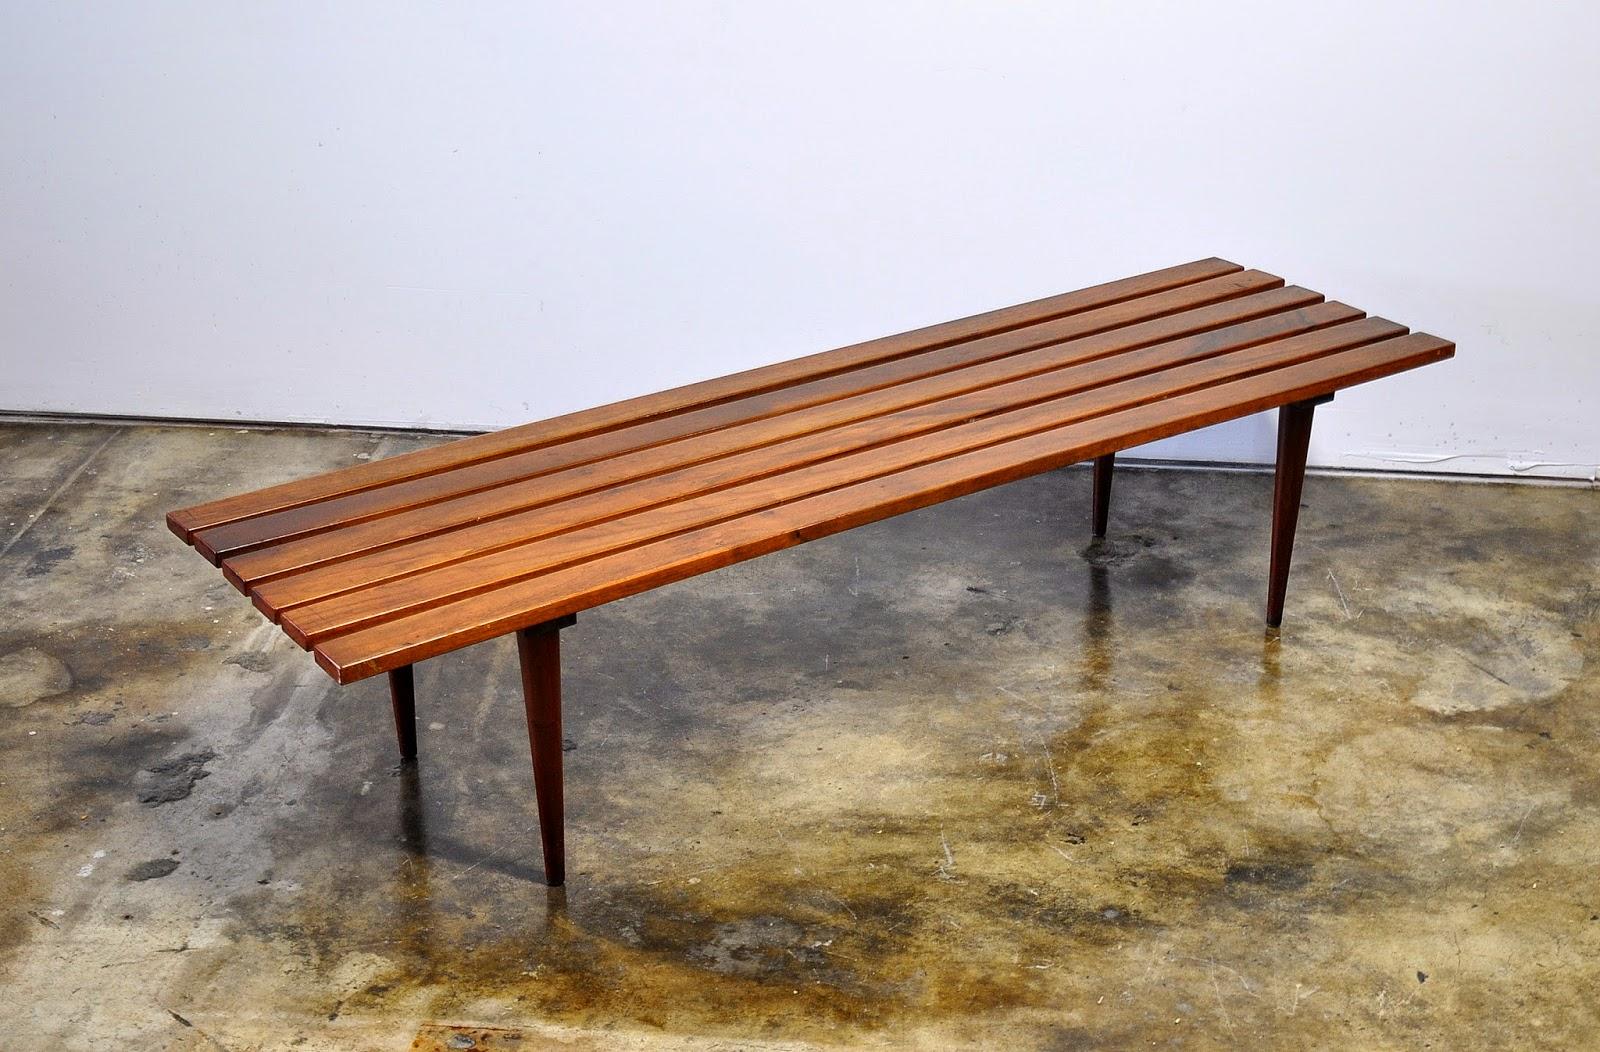 Mid Century Modern Slat Bench Part - 16: Mid Century Modern Slat Bench Or Coffee Table